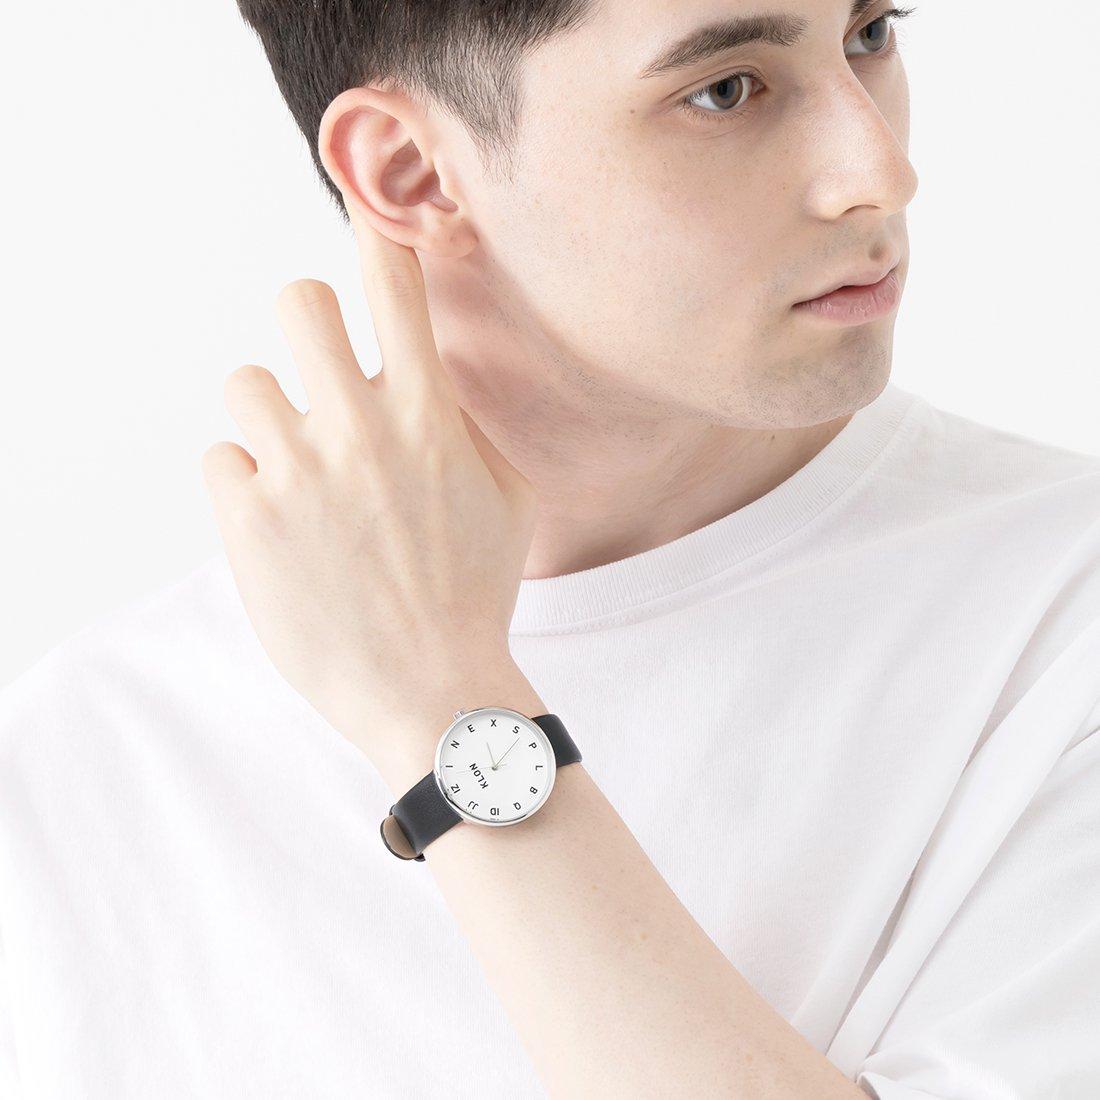 KLON_1万円台の腕時計